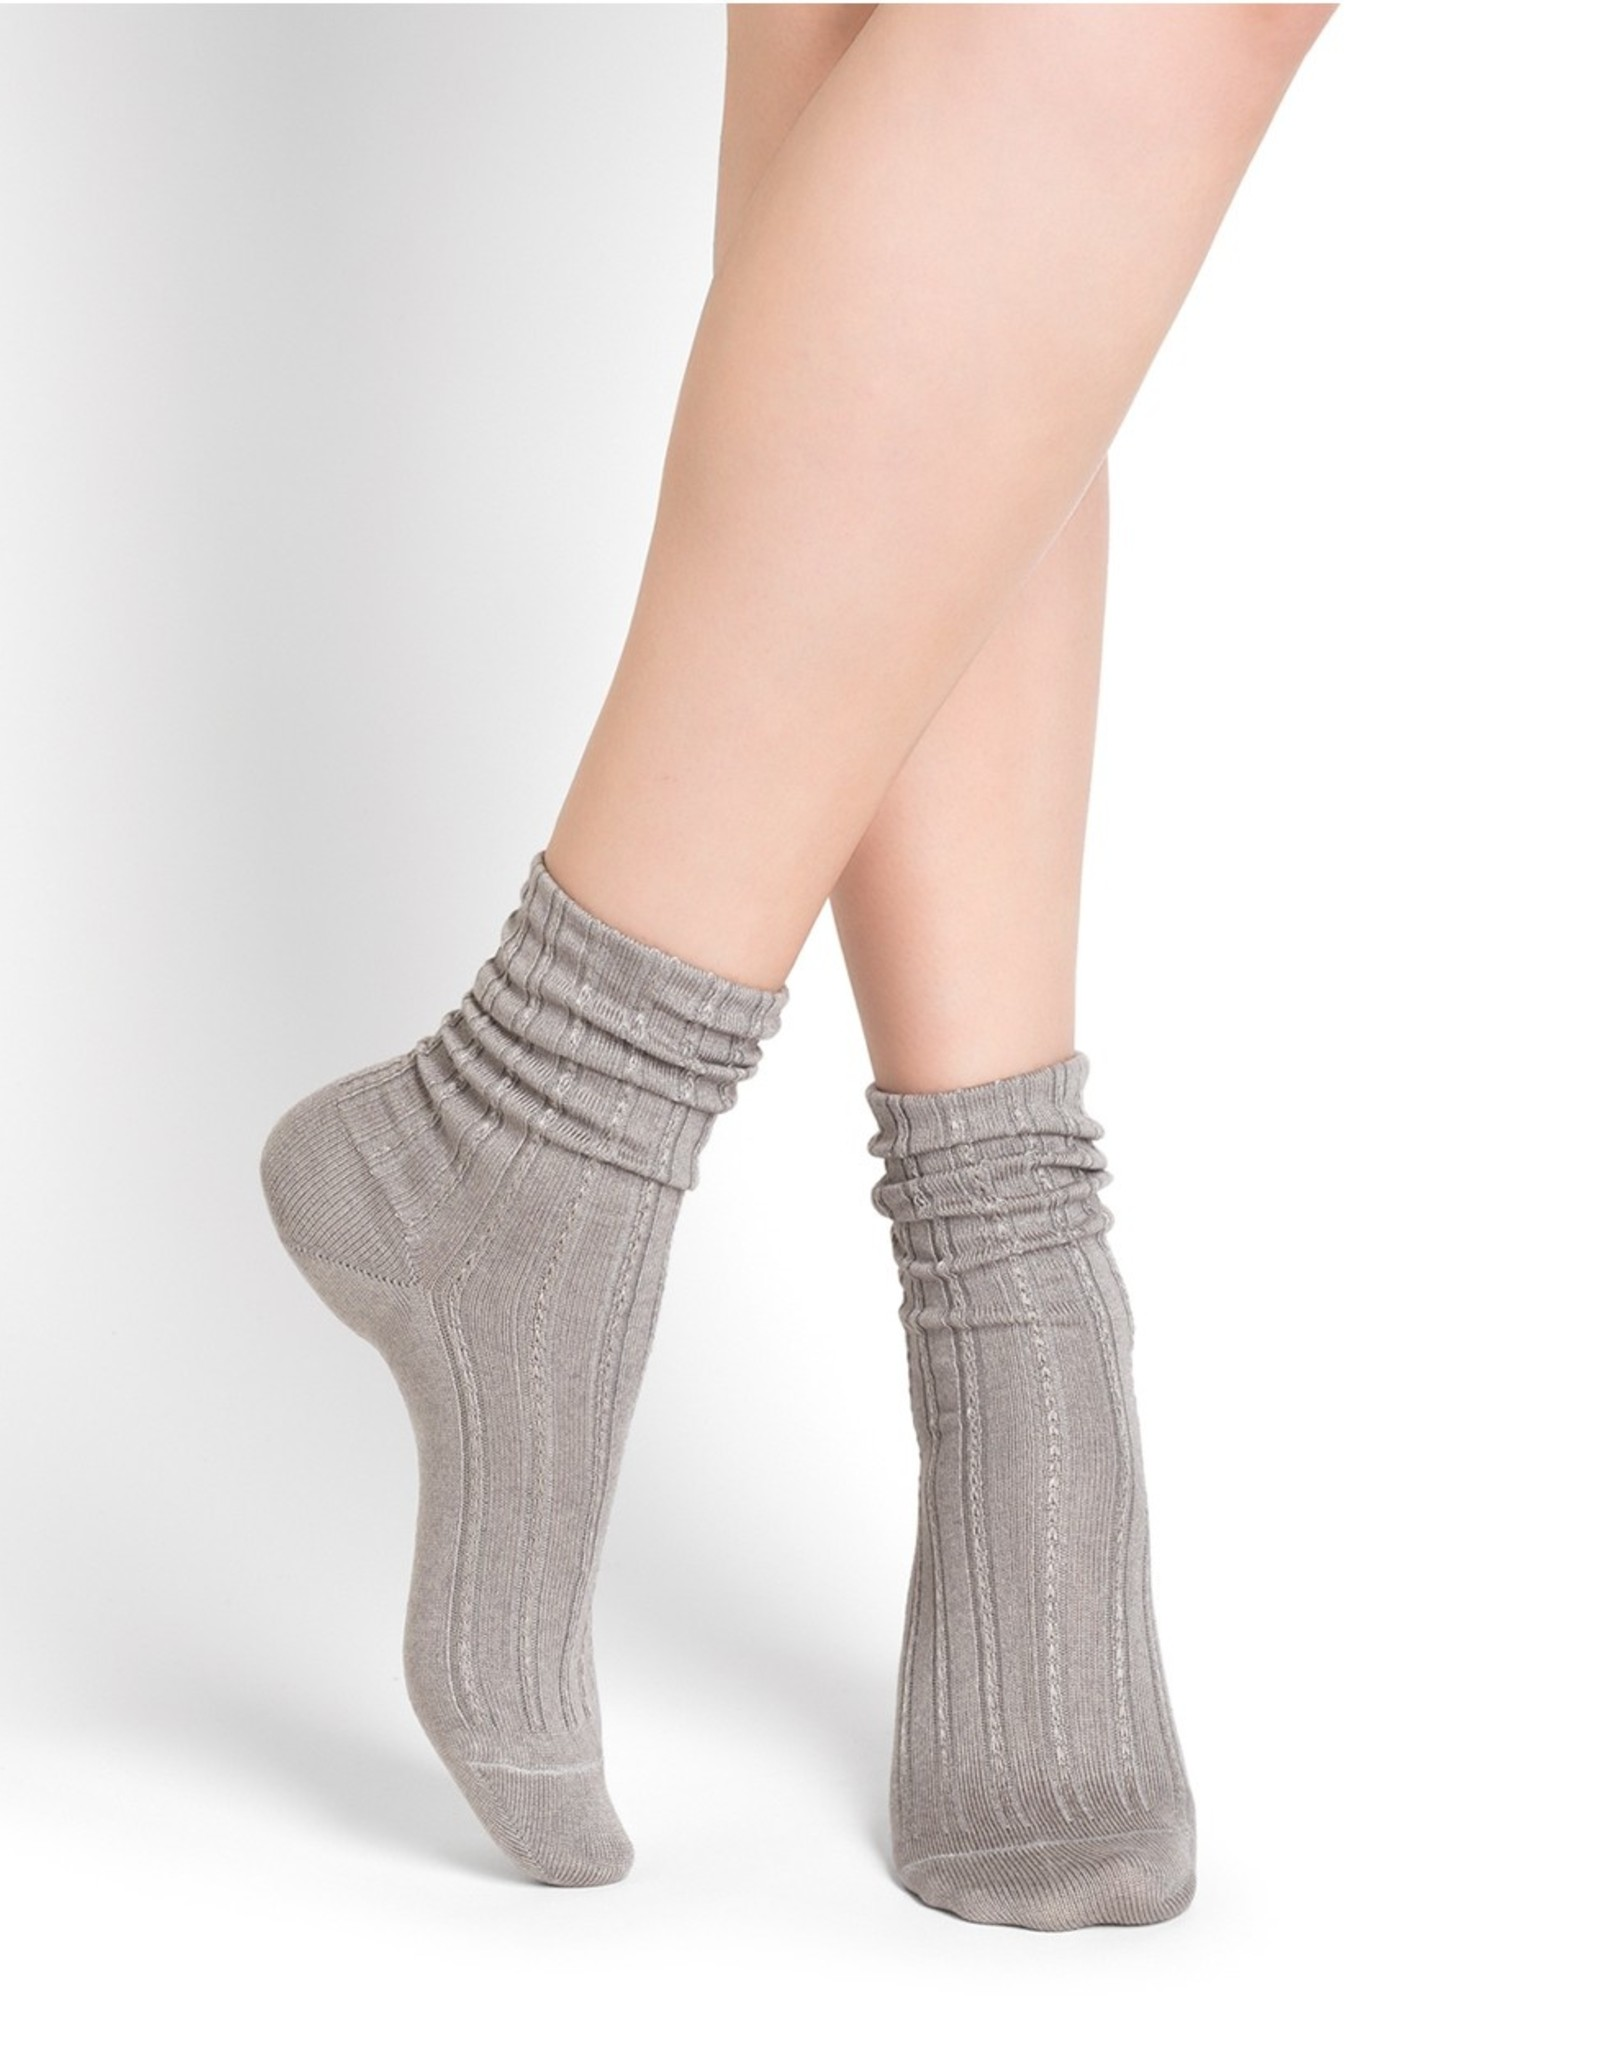 Bleuforet Micro-Modal and Cashmere Socks